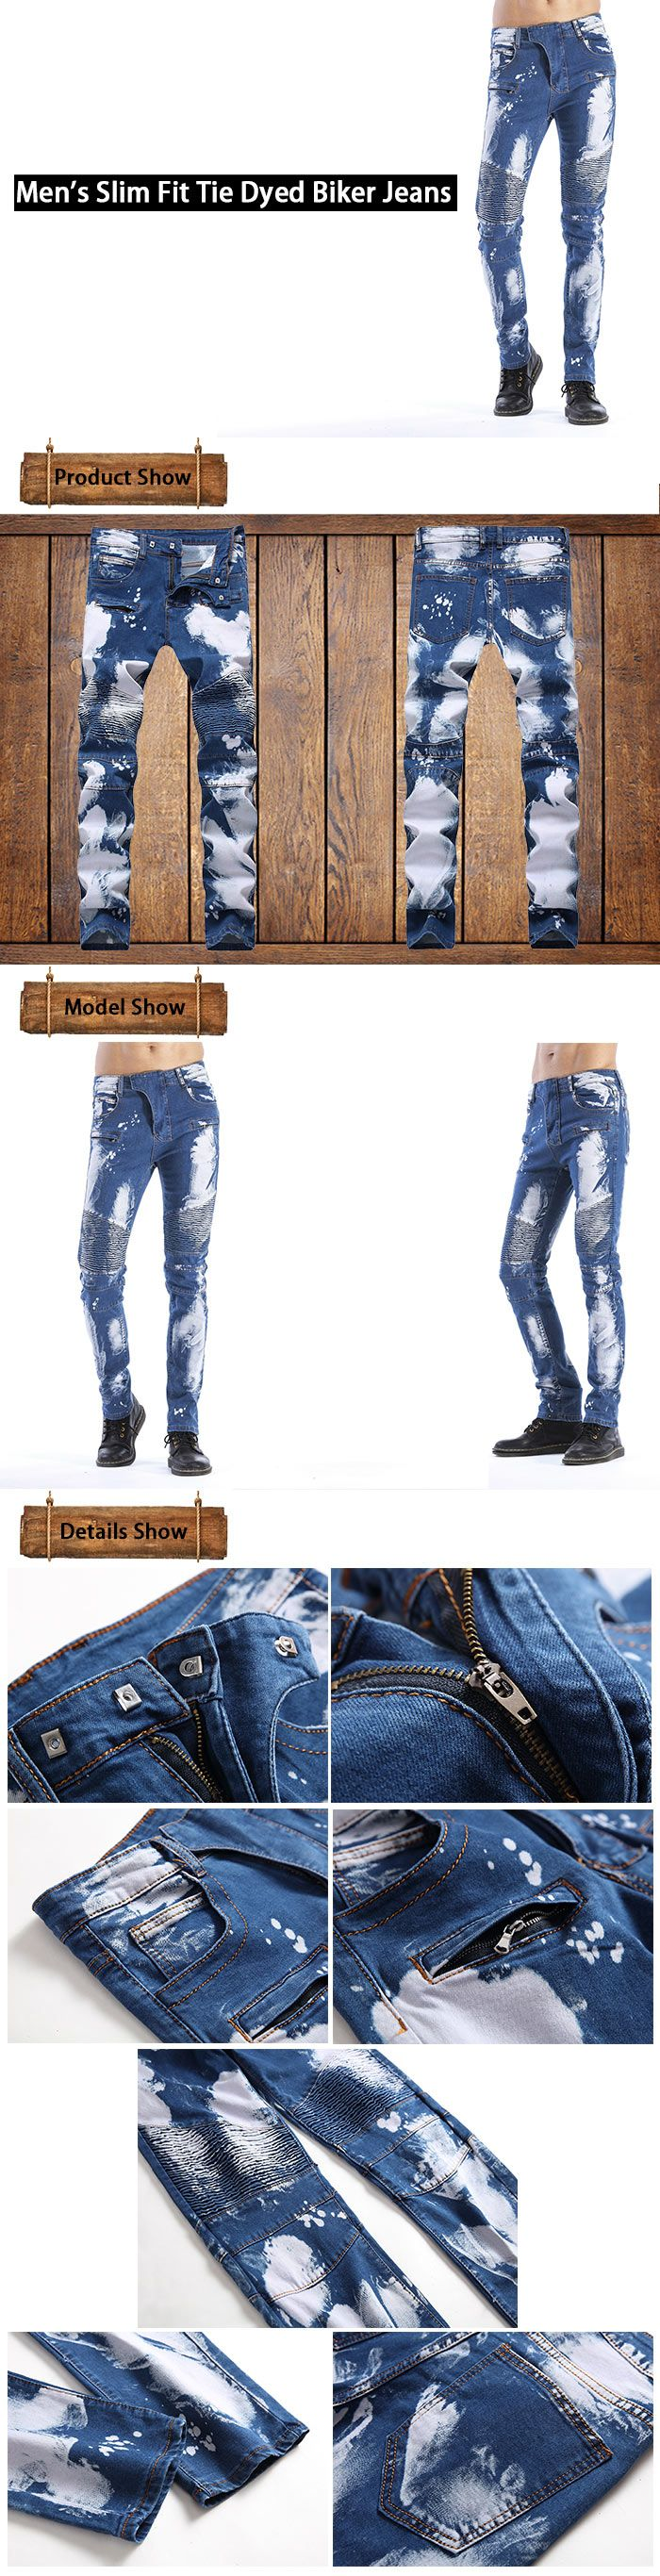 Slim Fit Tie Dyed Biker Jeans